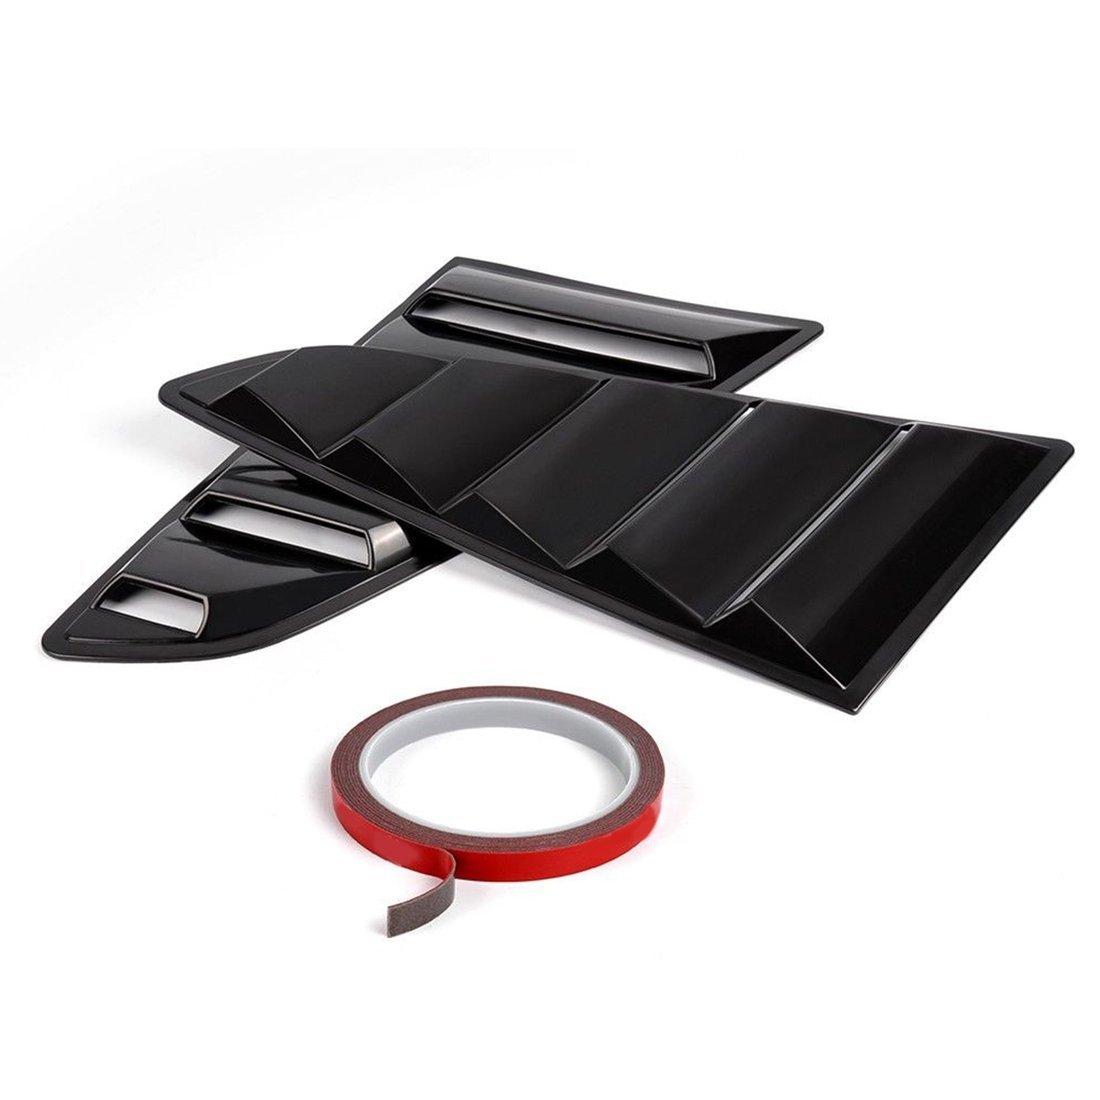 Luces de Ventana Laterales de Plata GT Style PP Ingot para Ford para Mustang 2015-2017 (Color: Negro) Dailyinshop